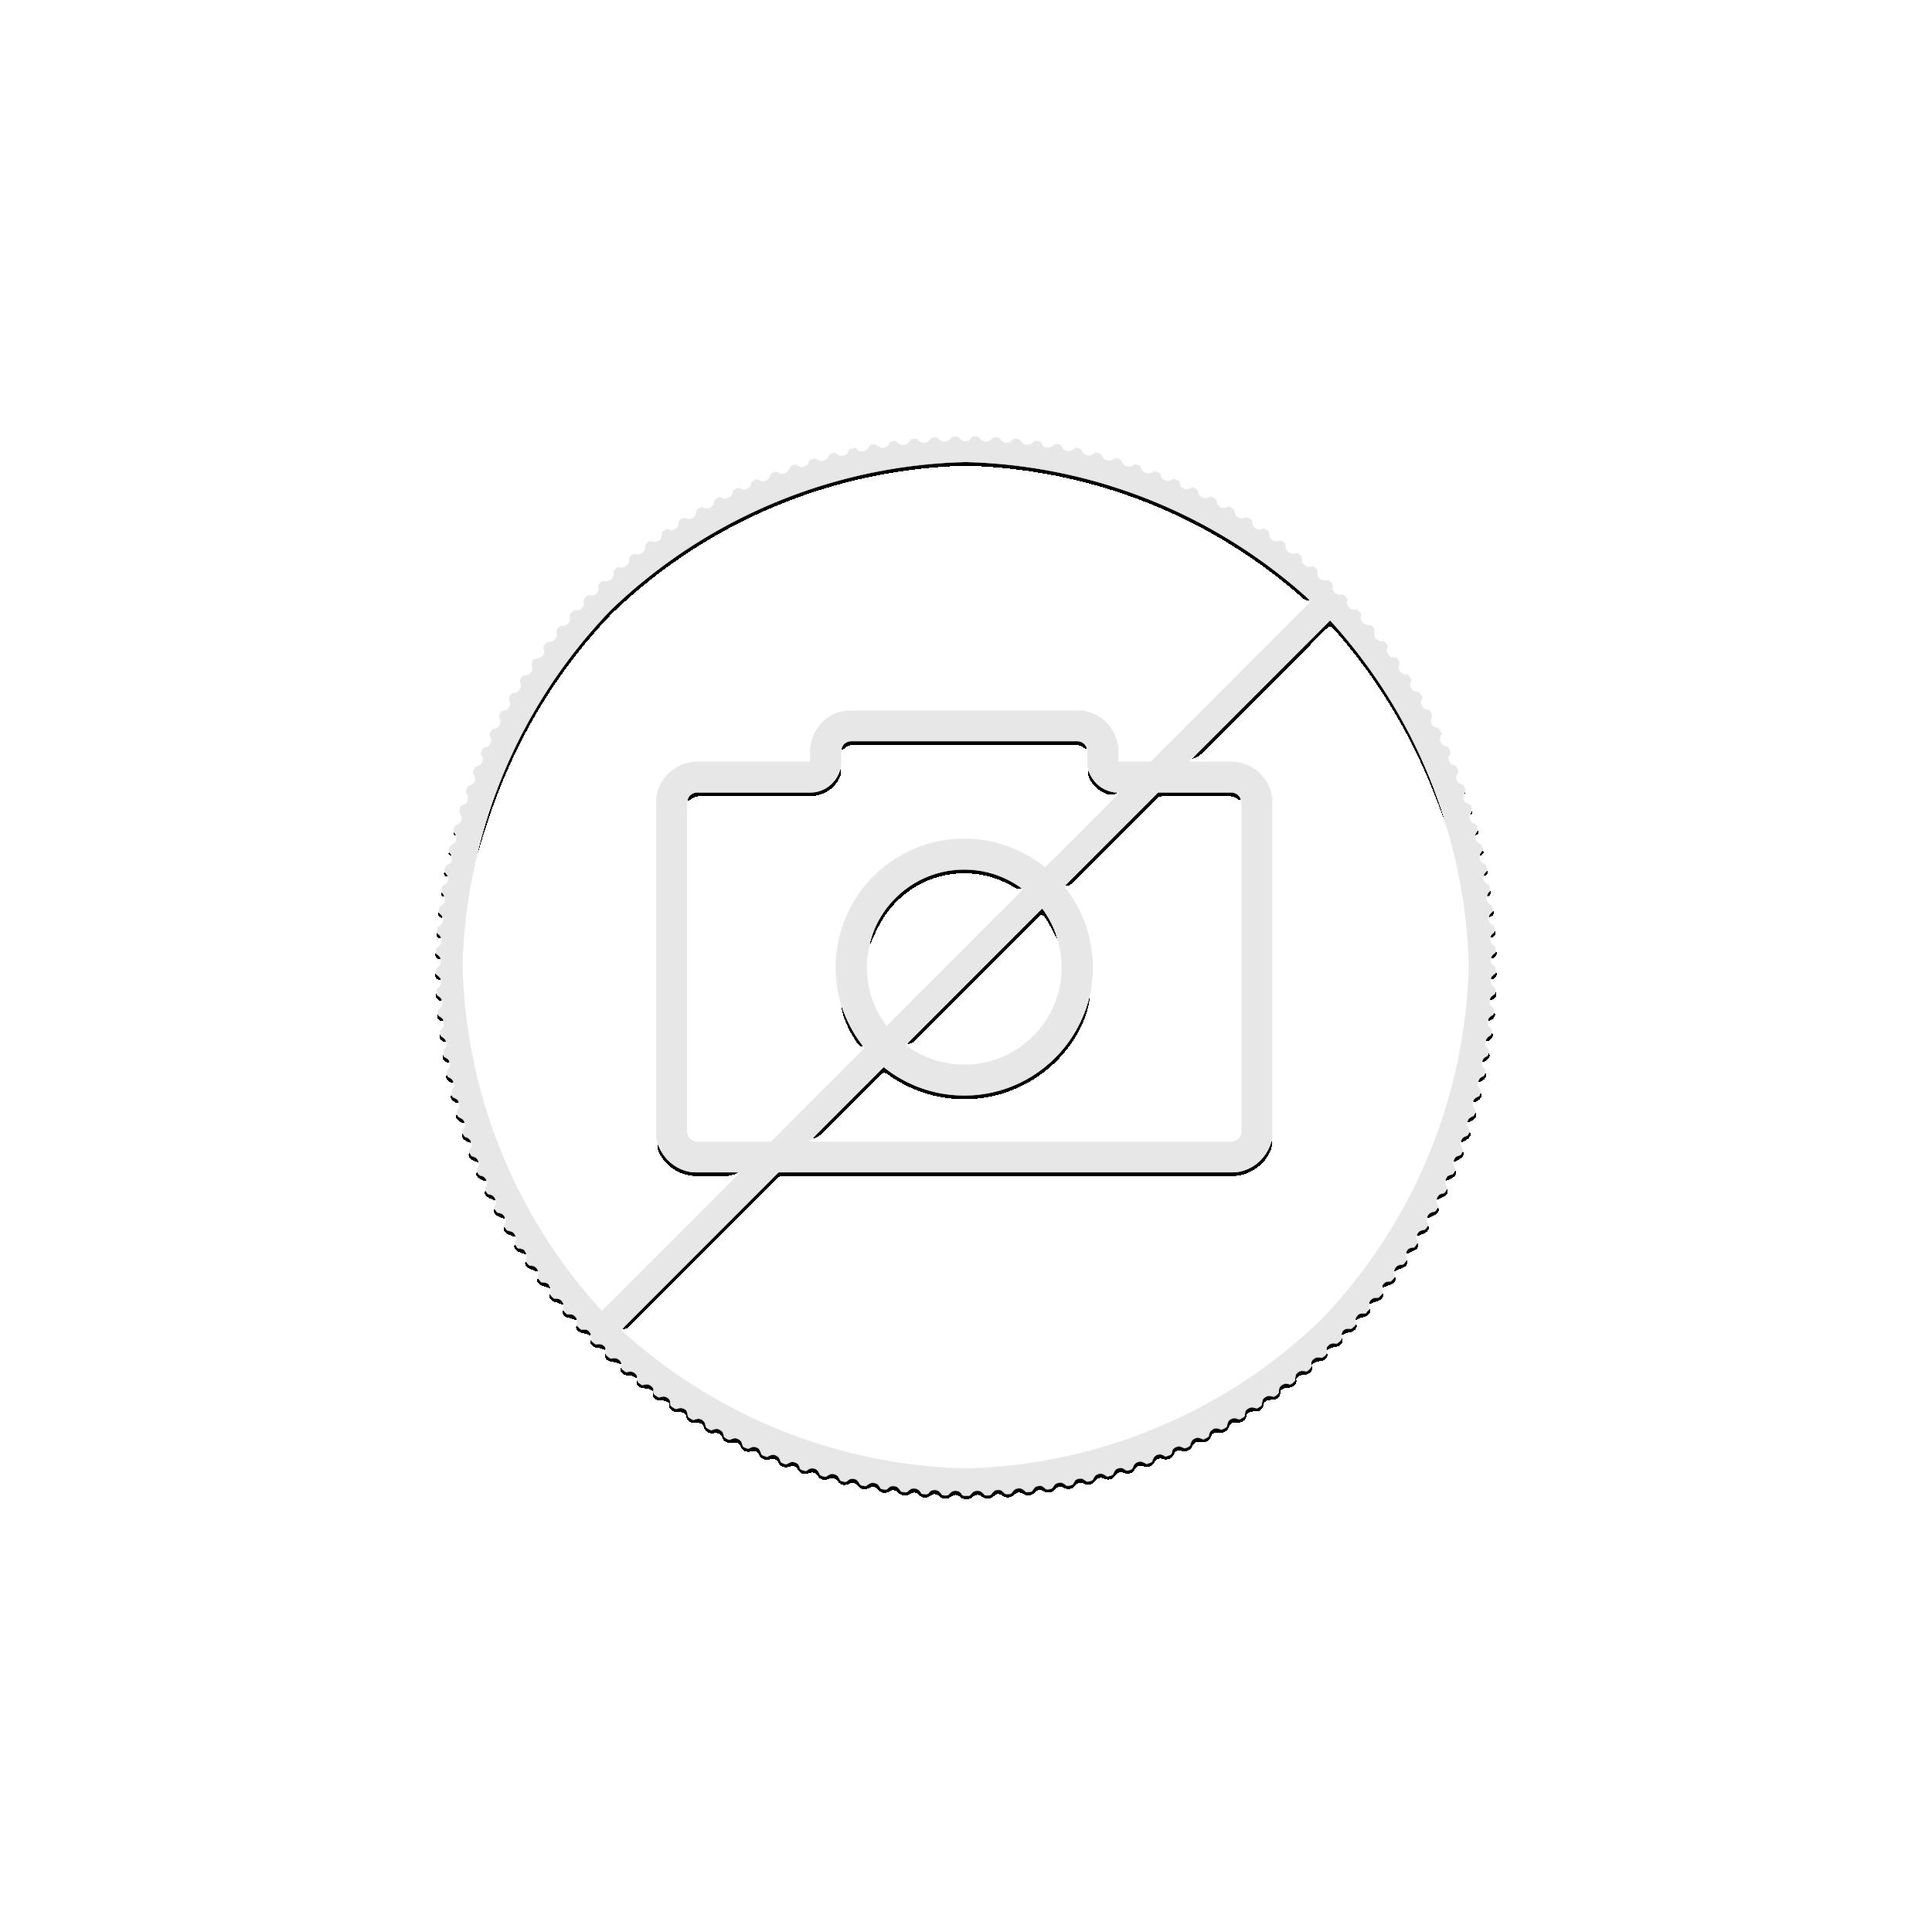 1 Troy ounce palladium baar diverse producenten